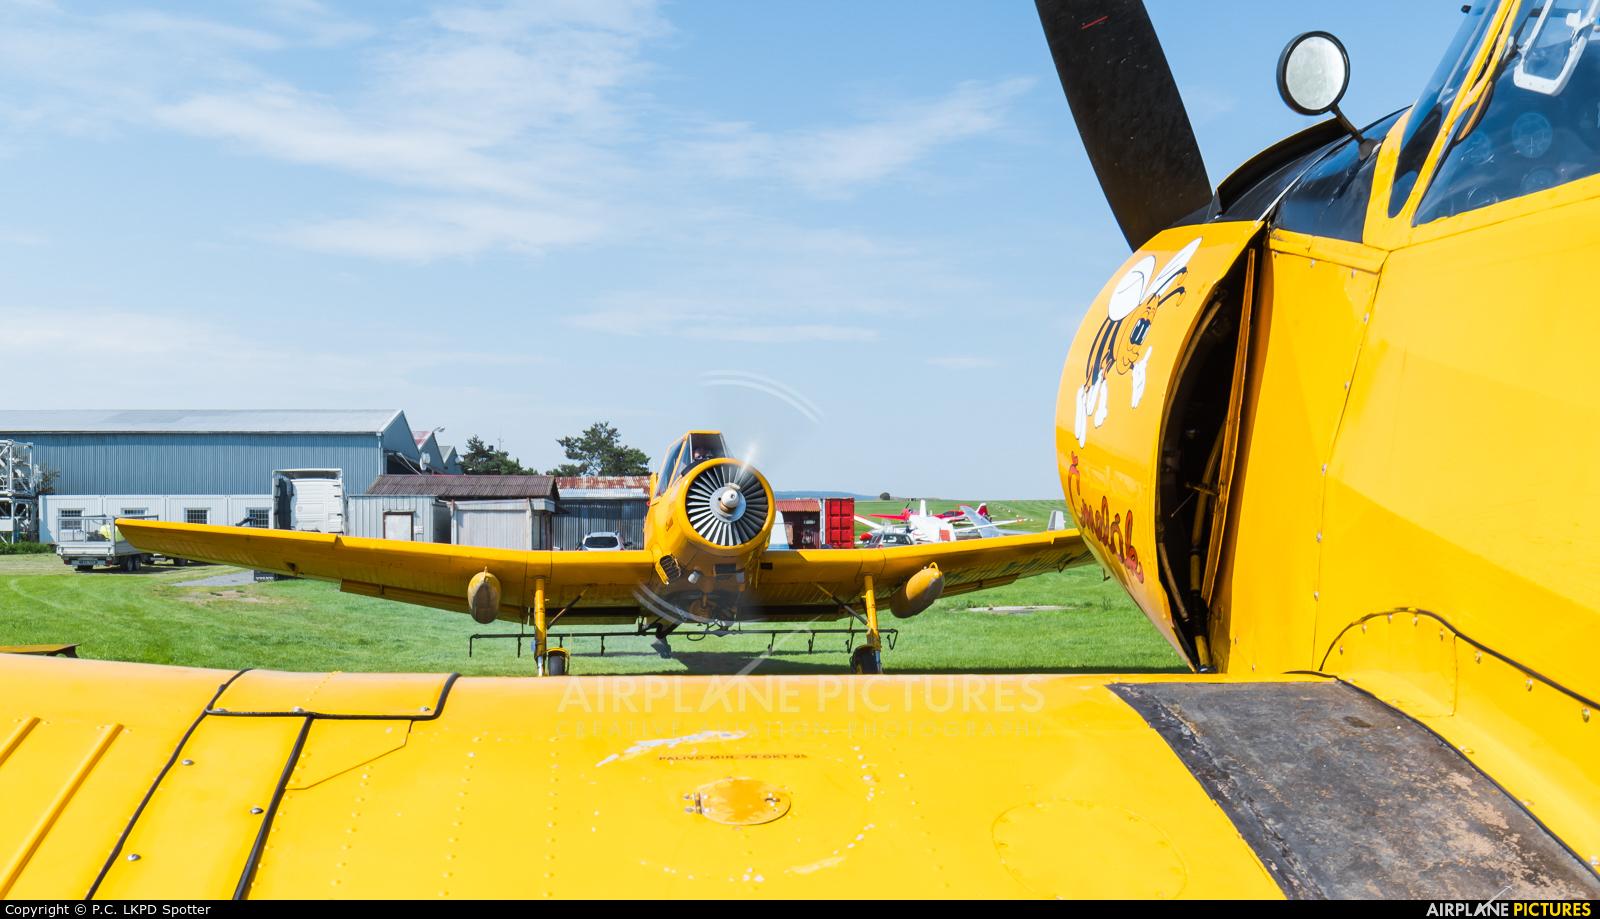 Agroair OK-KJB aircraft at Chrudim